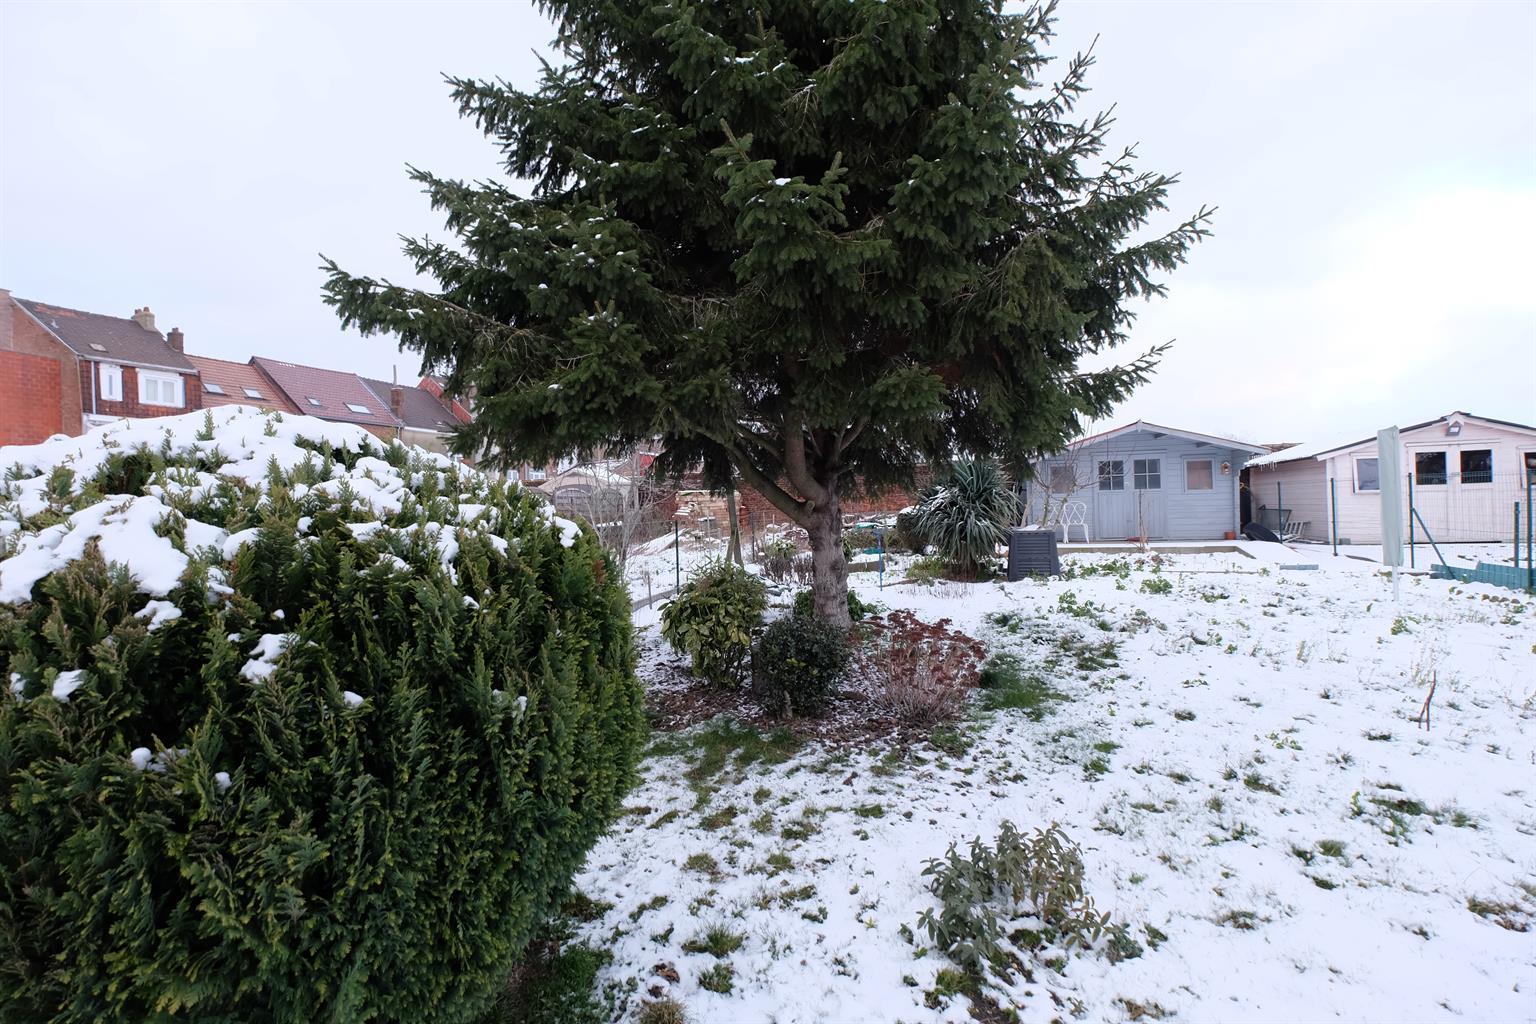 Maison - Tubize - #4310505-15